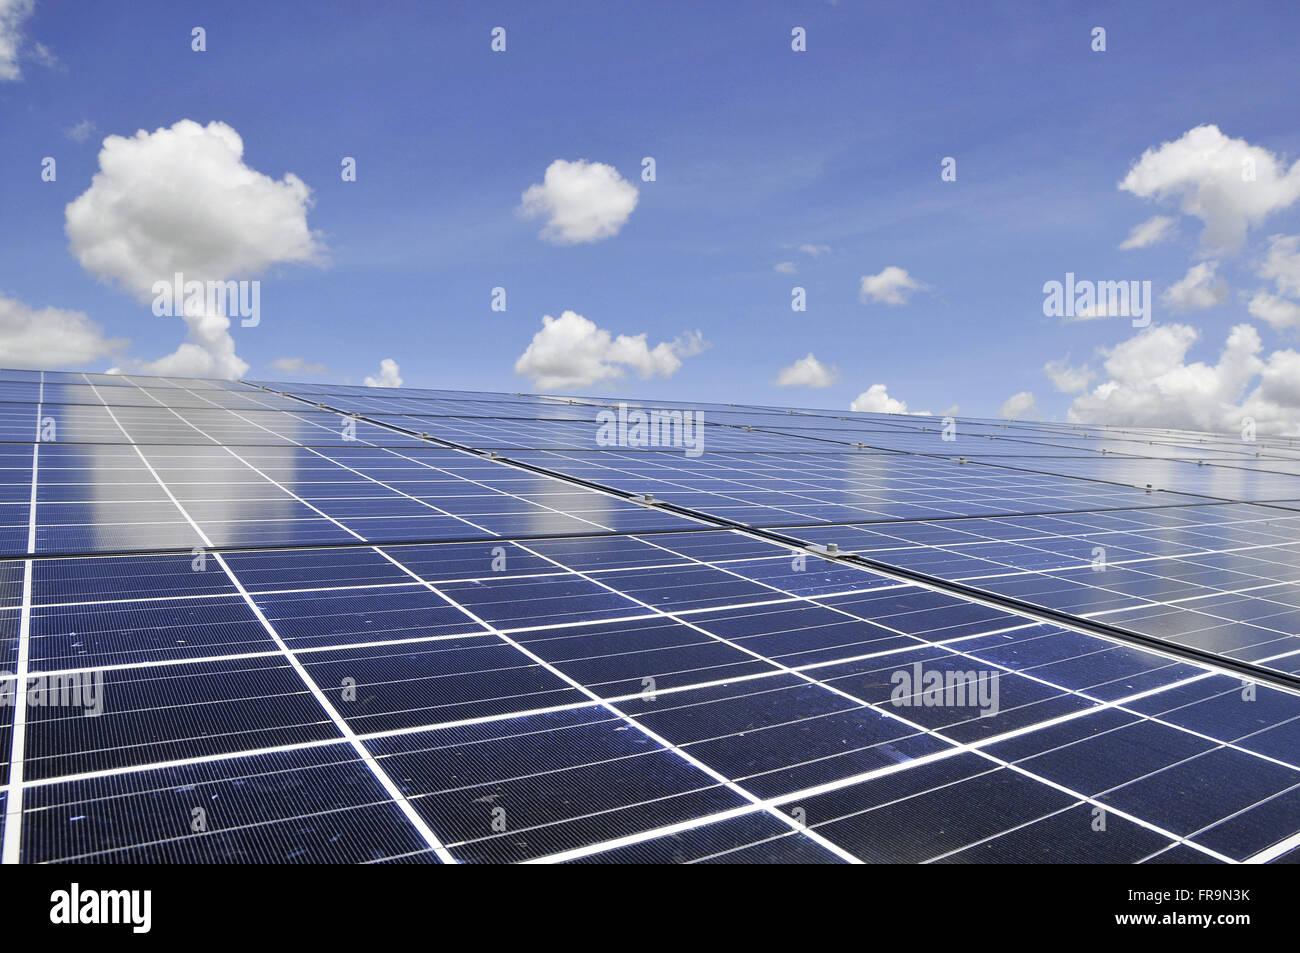 Signos de Energía Solar Imagen De Stock